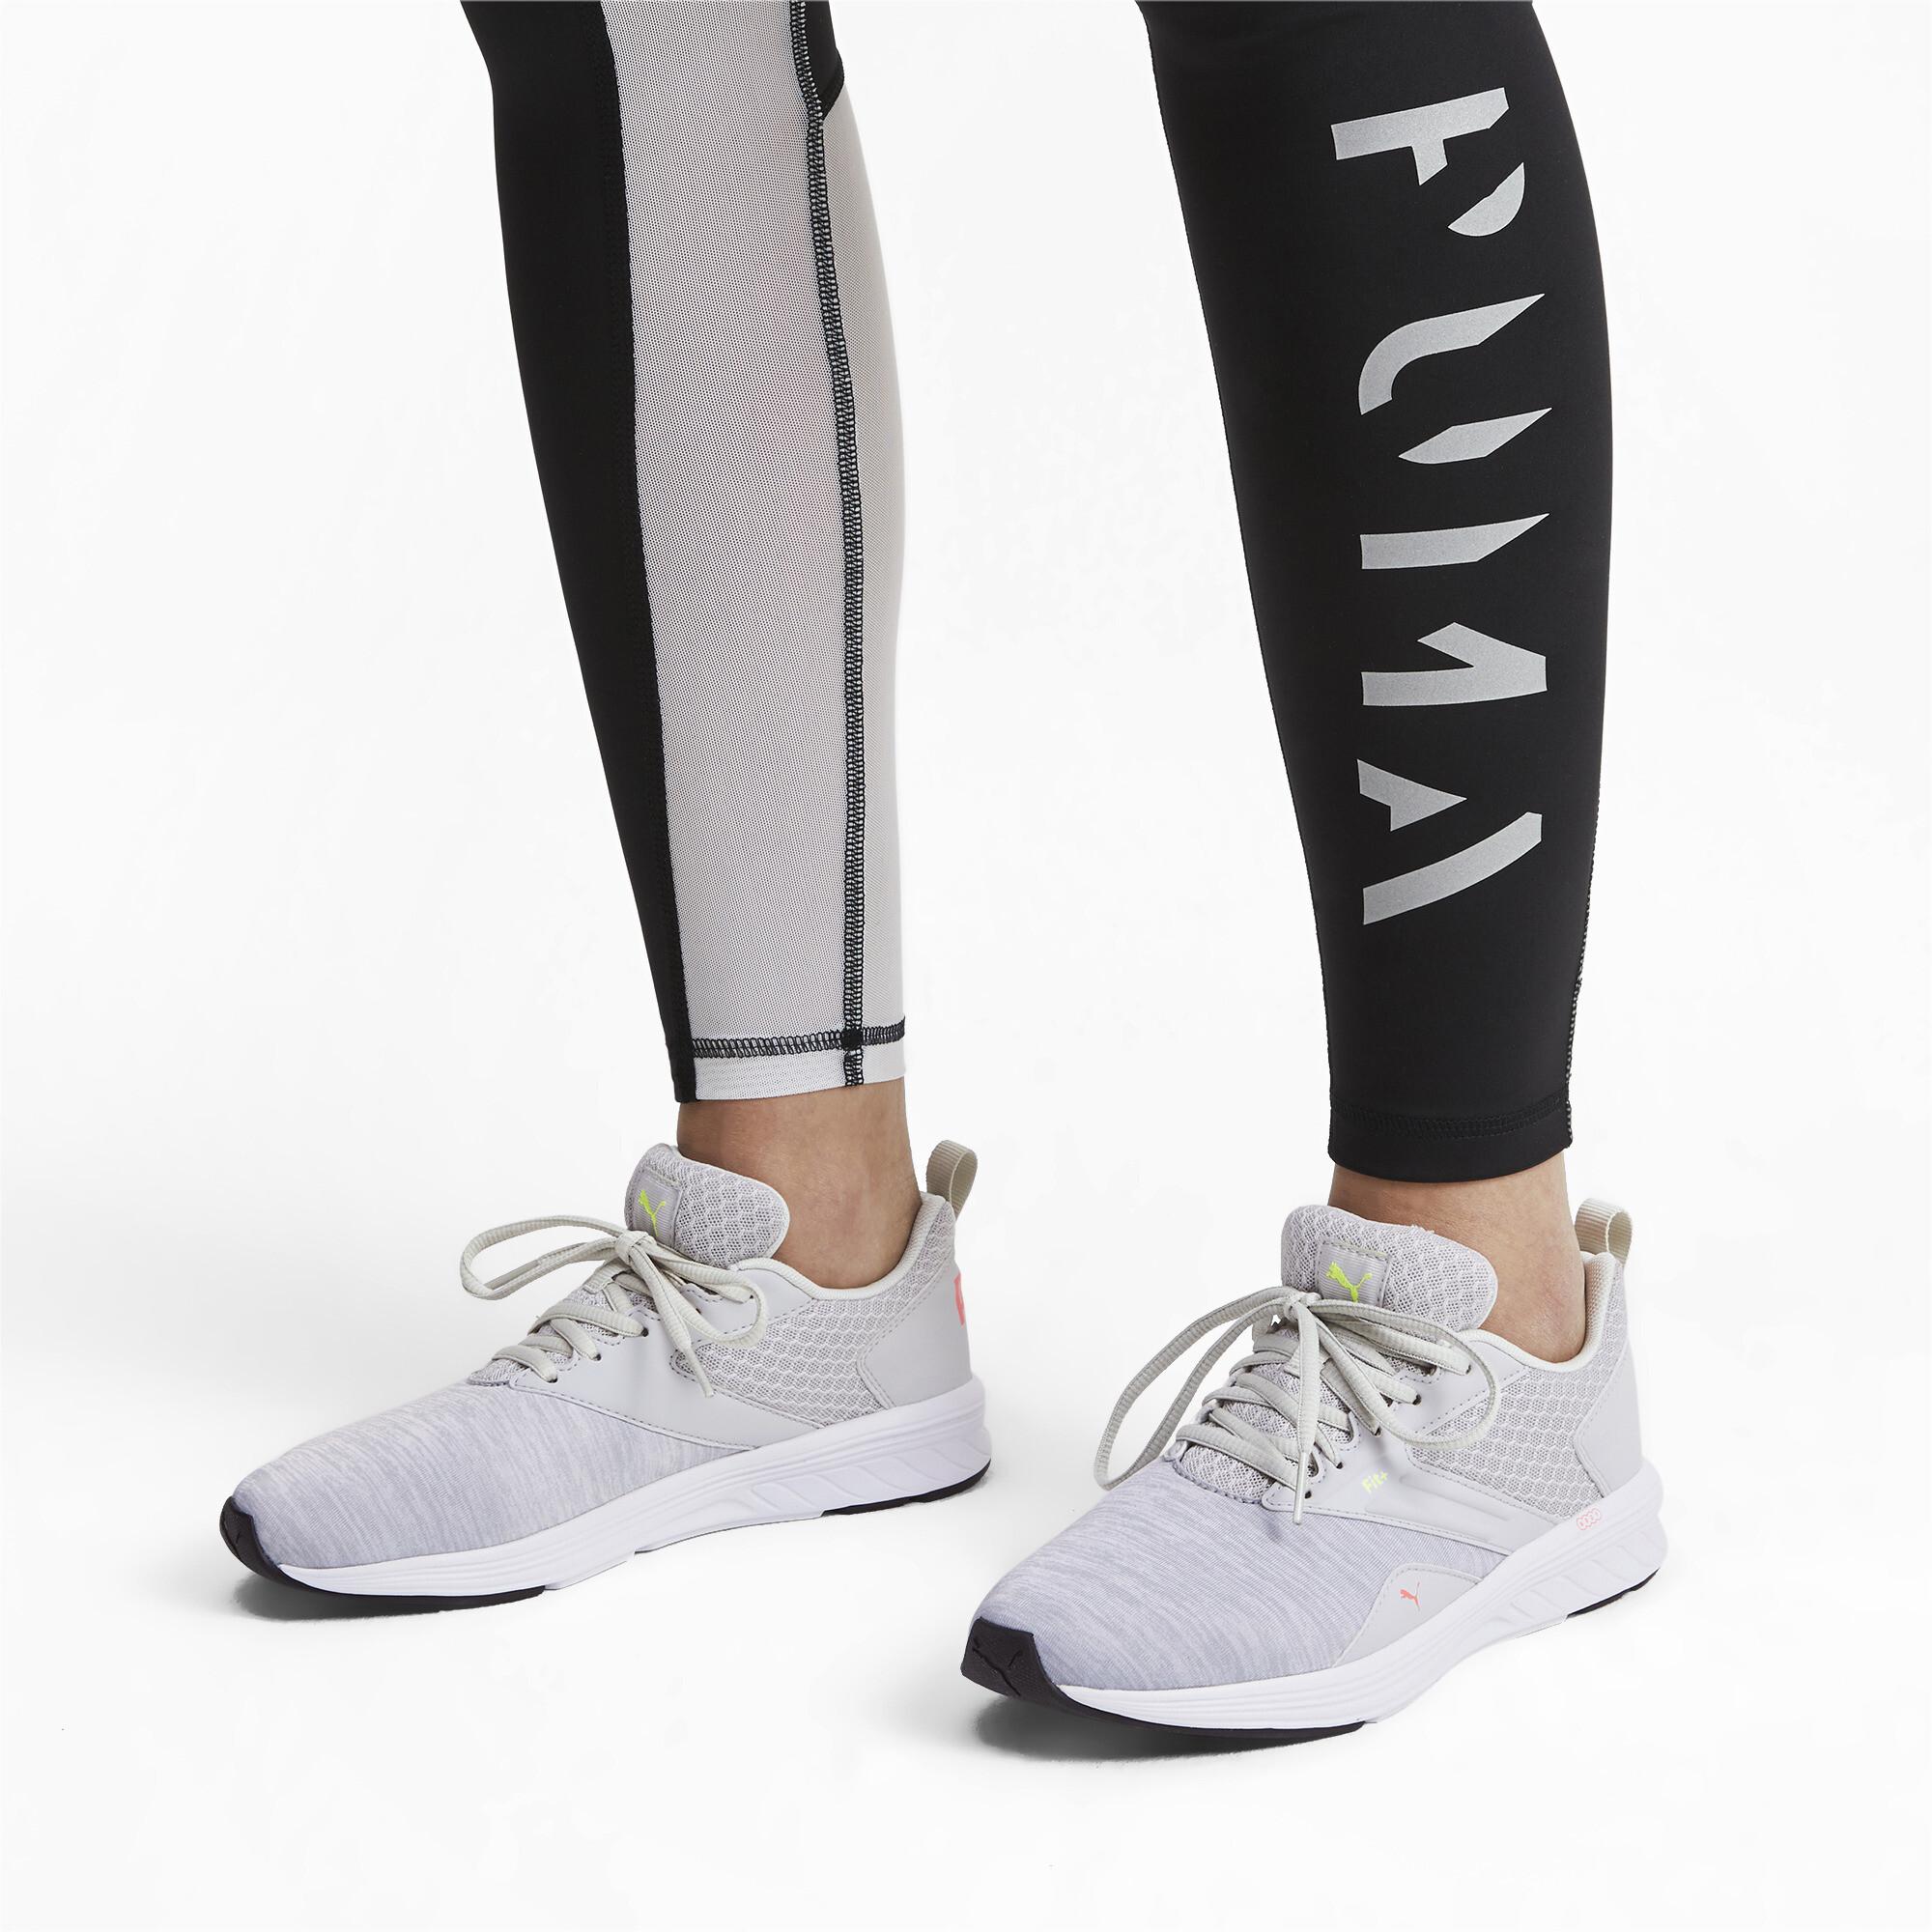 PUMA-NRGY-Comet-Men-039-s-Running-Shoes-Men-Shoe-Running thumbnail 24